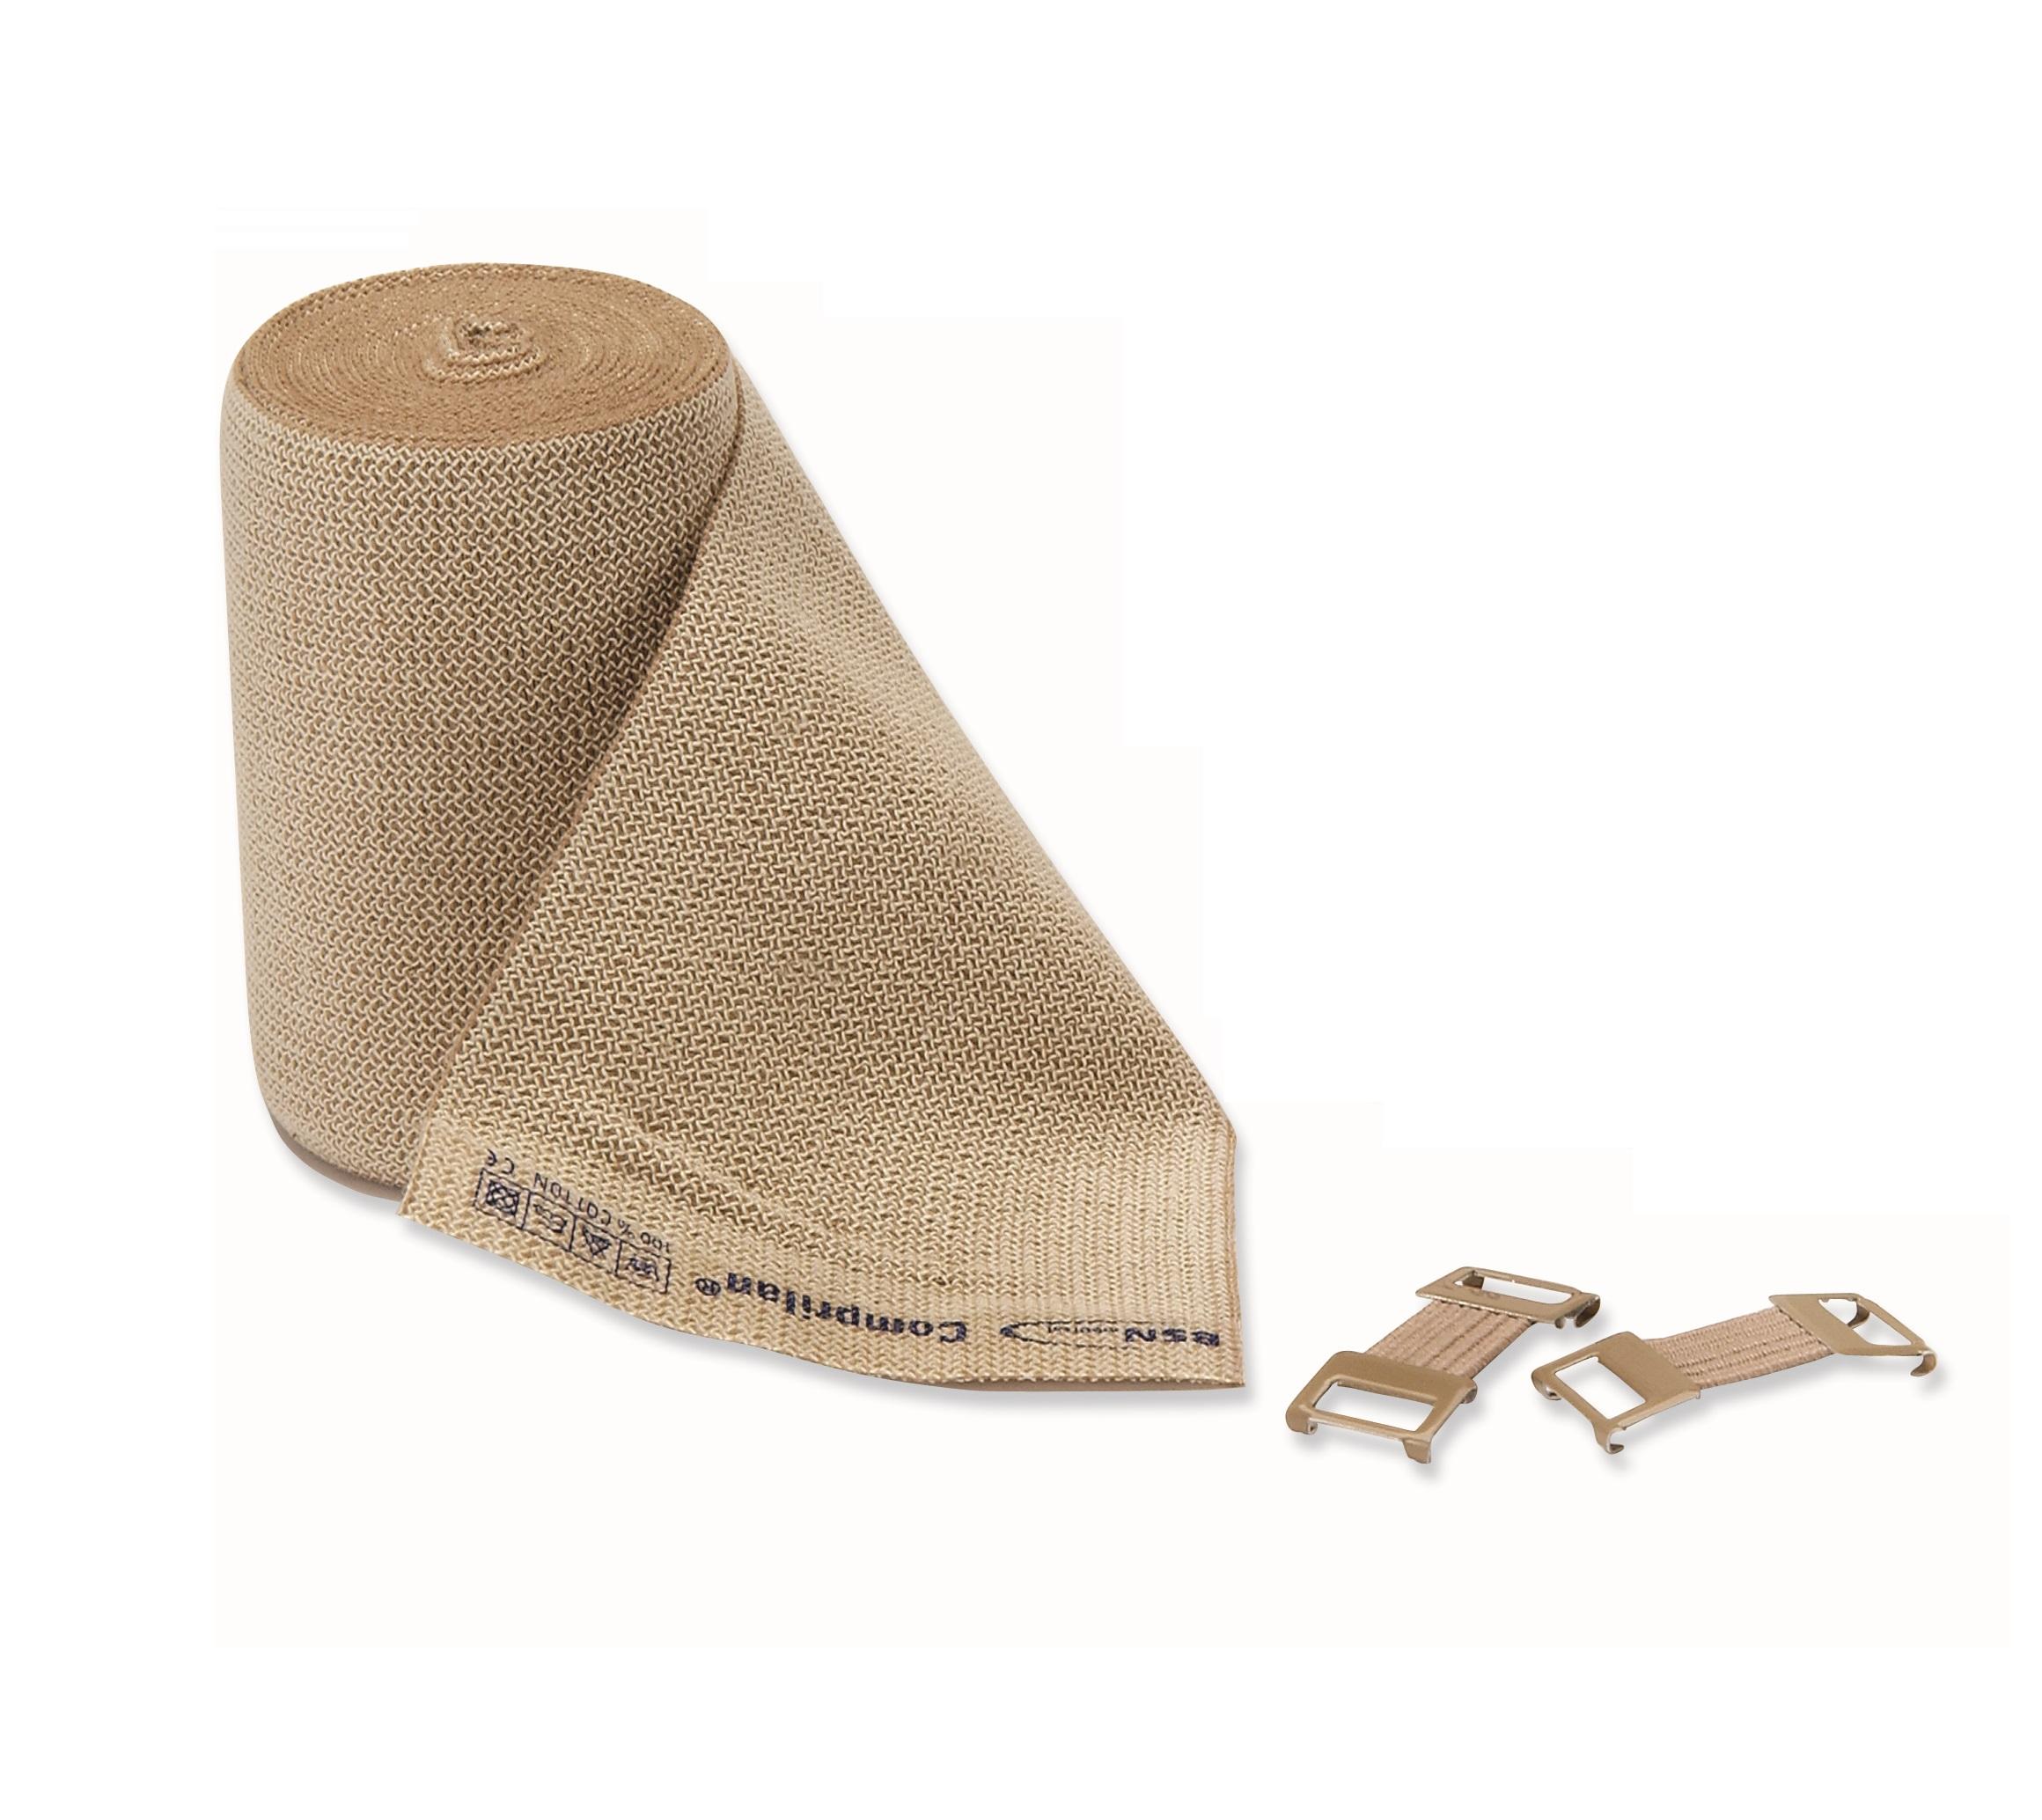 "JOBST® Comprilan® Short Stretch Bandage 4.5""x10Yd/12Cm X 10M"